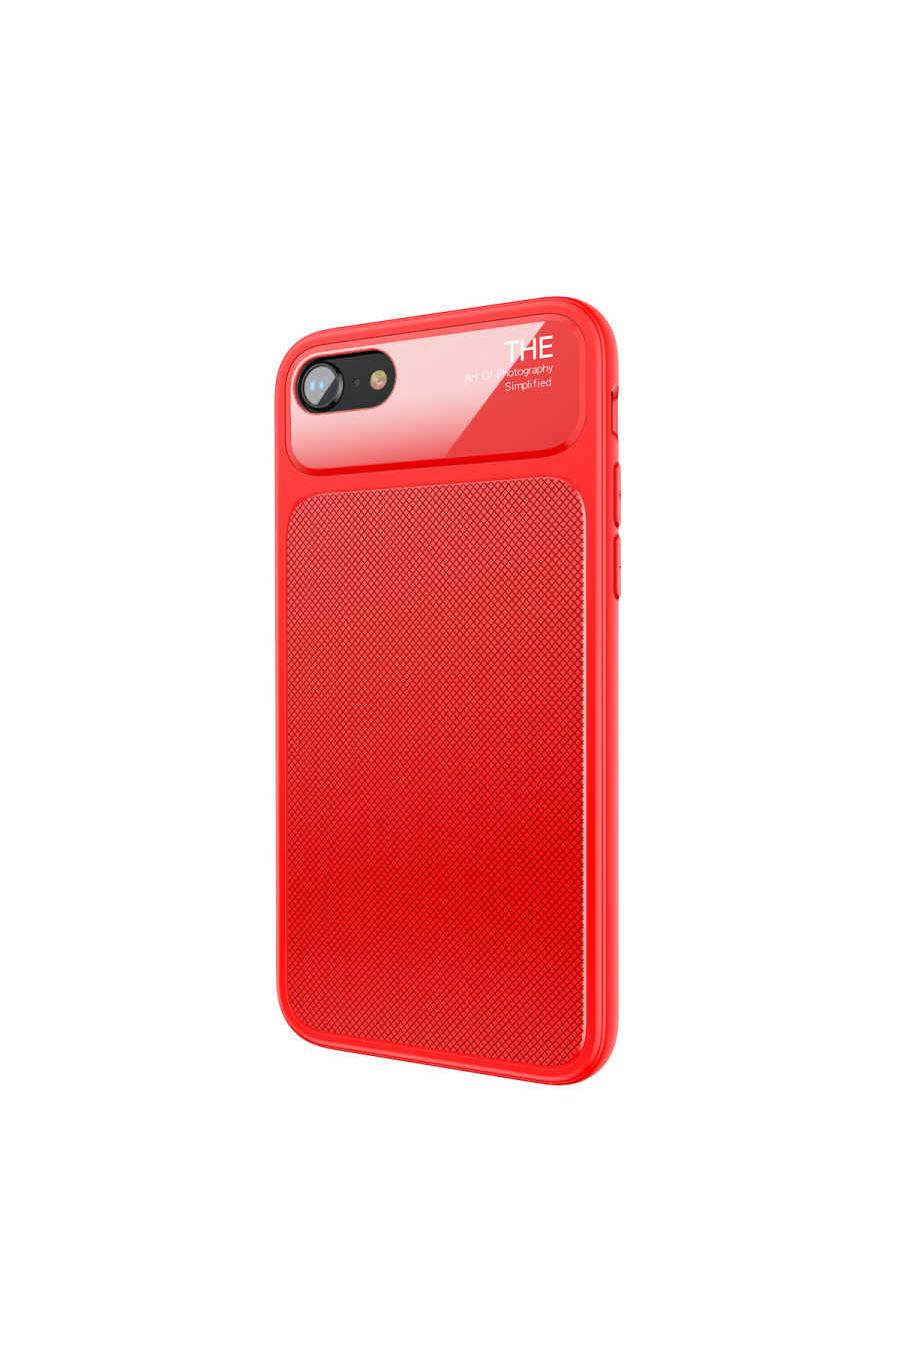 Apple iPhone 7 Kılıf Baseus Knight Case